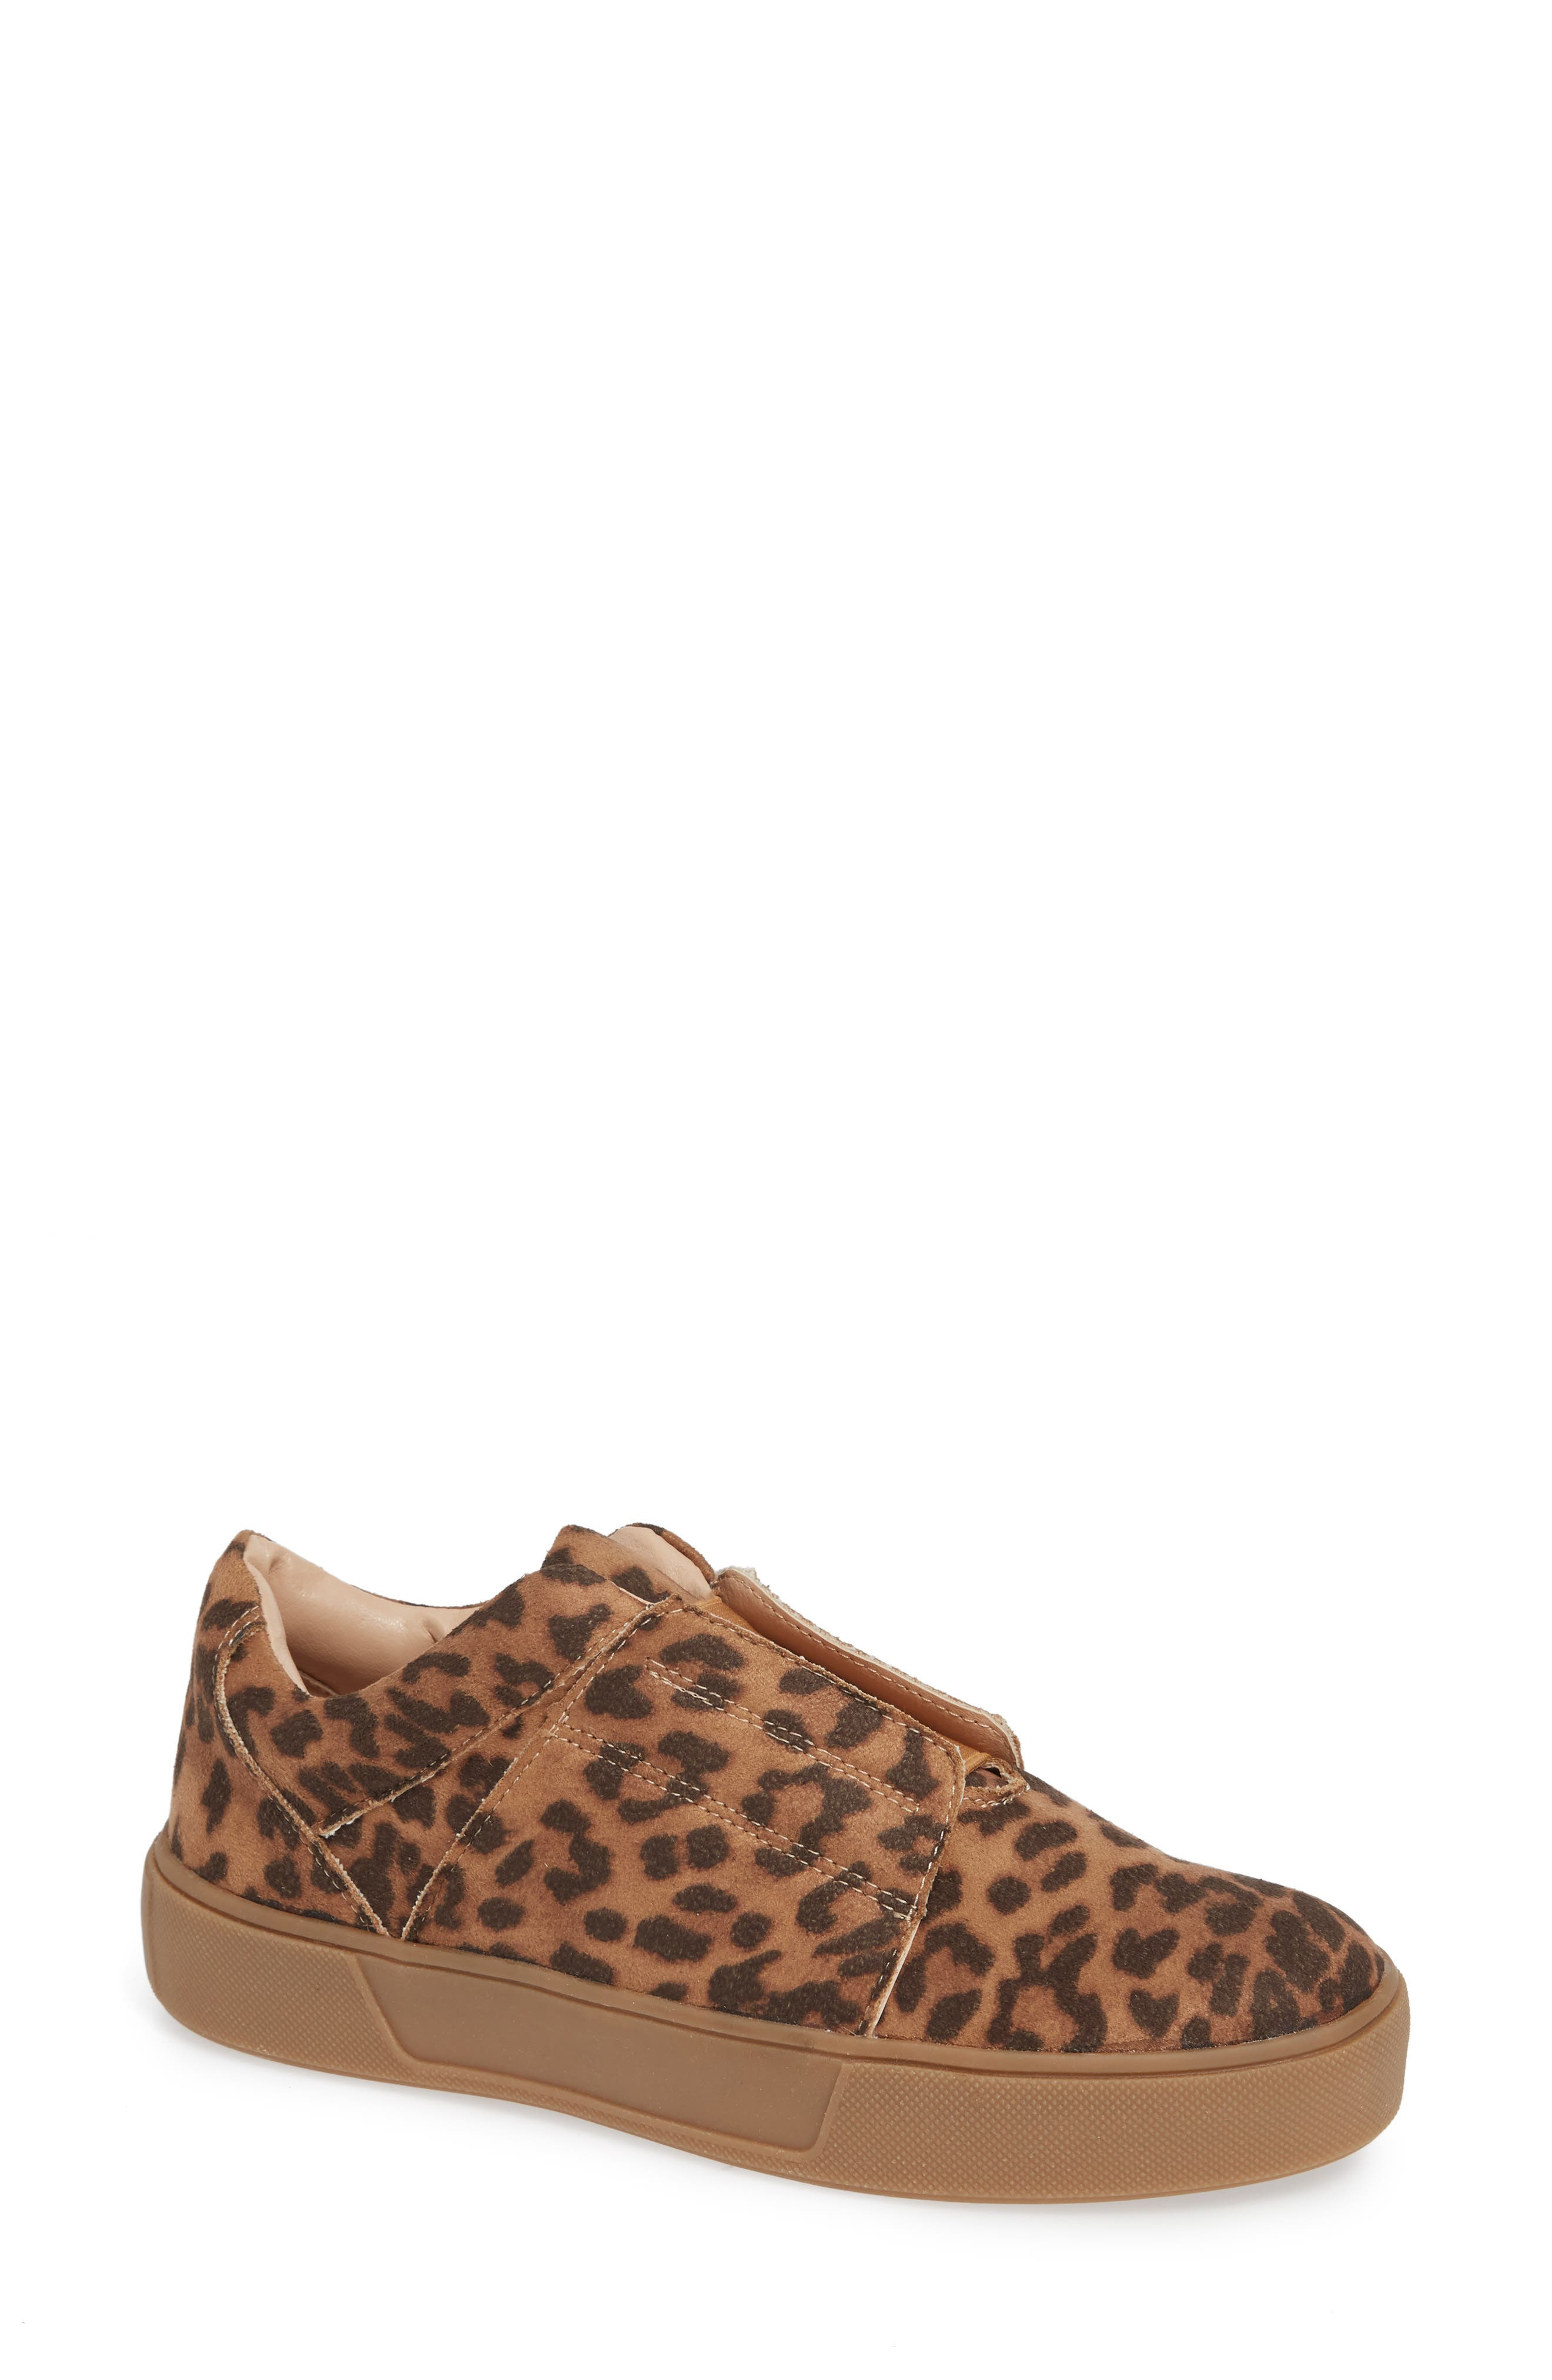 Tamera Slip-On Sneaker,                             Main thumbnail 1, color,                             TAN/ LEOPARD MULTI - FABRIC